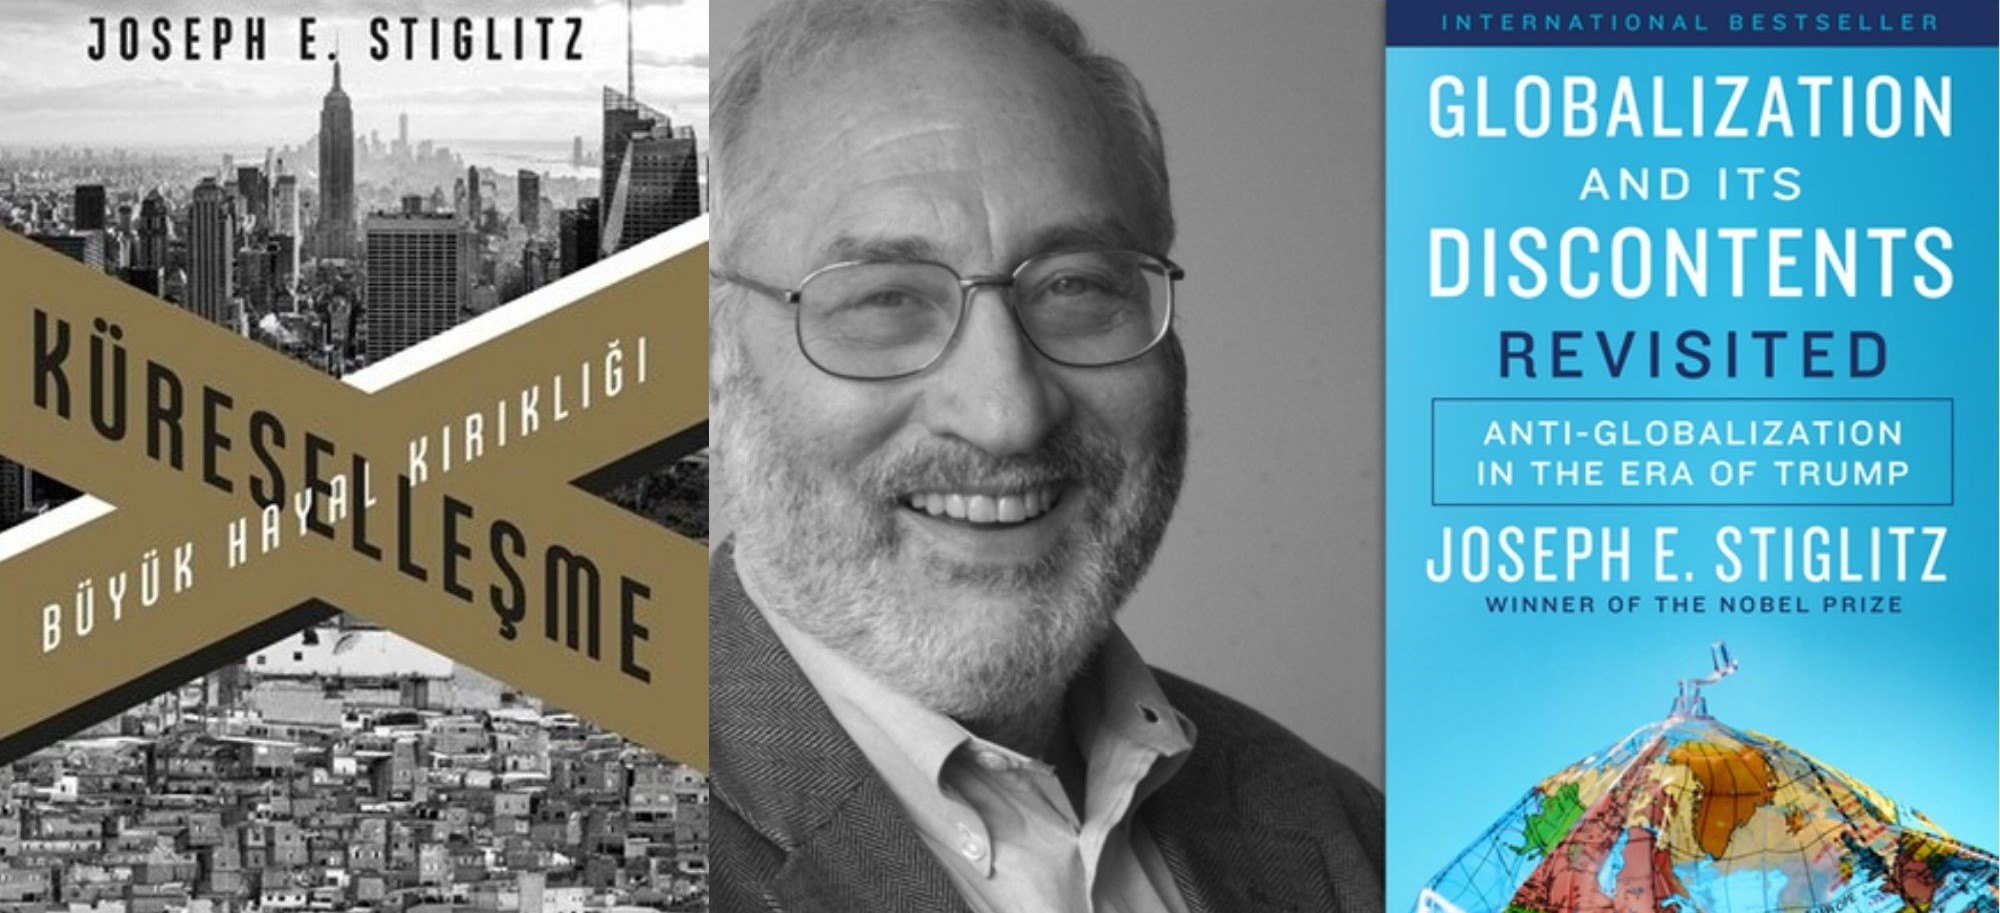 JOSEPH E. STIGLITZ / Küreselleşme-Büyük Hayal Kırıklığı